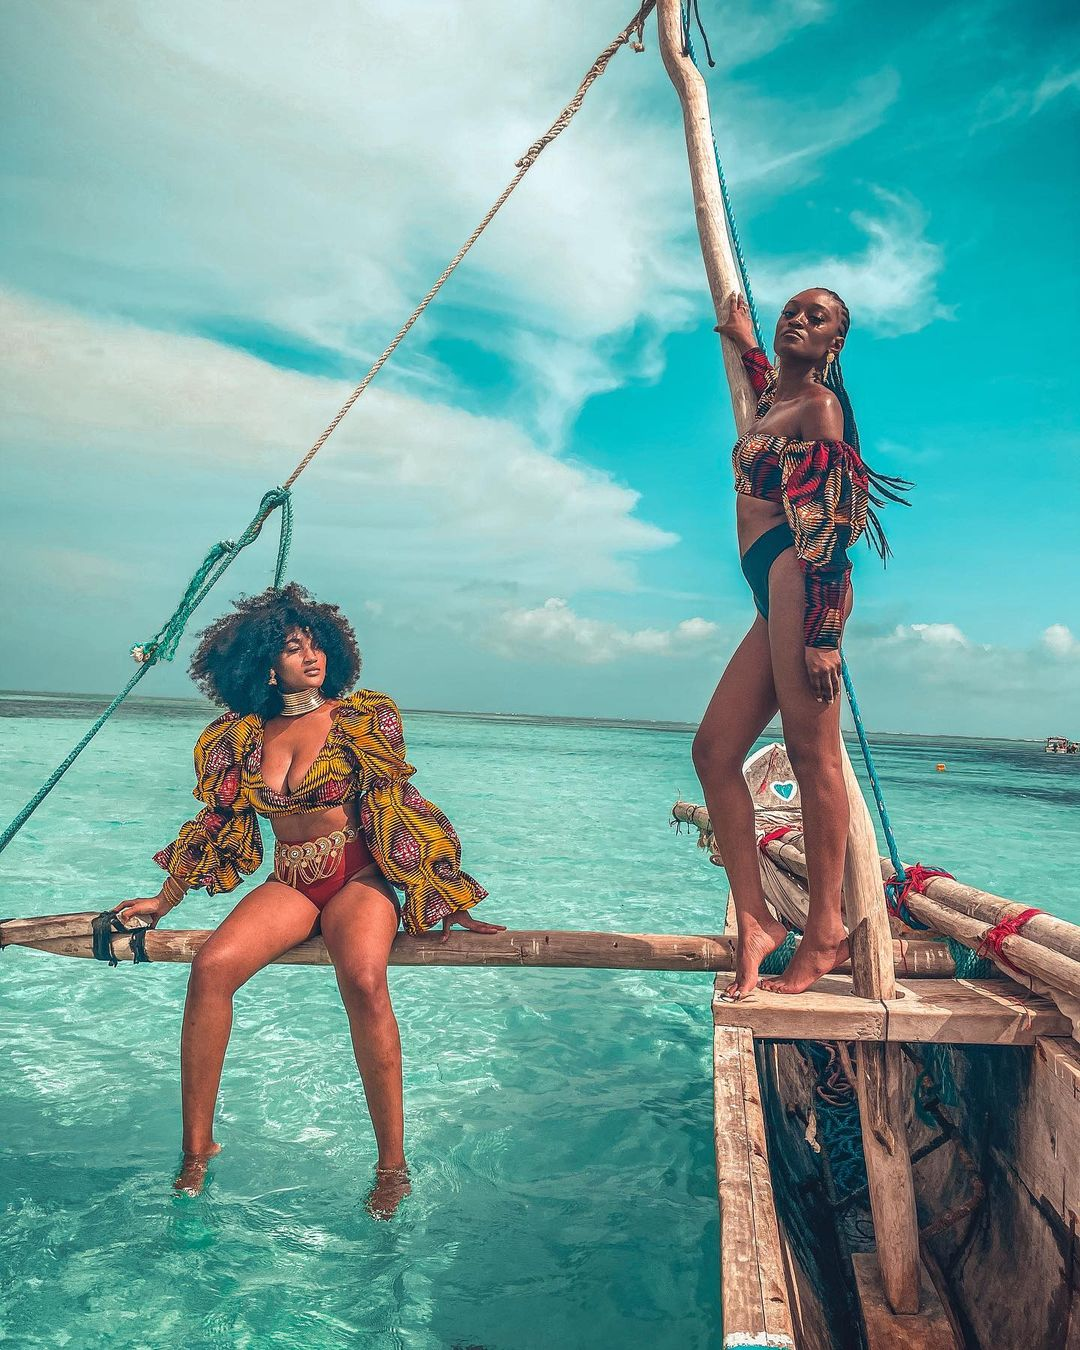 Tanzania hottest destinations in africa